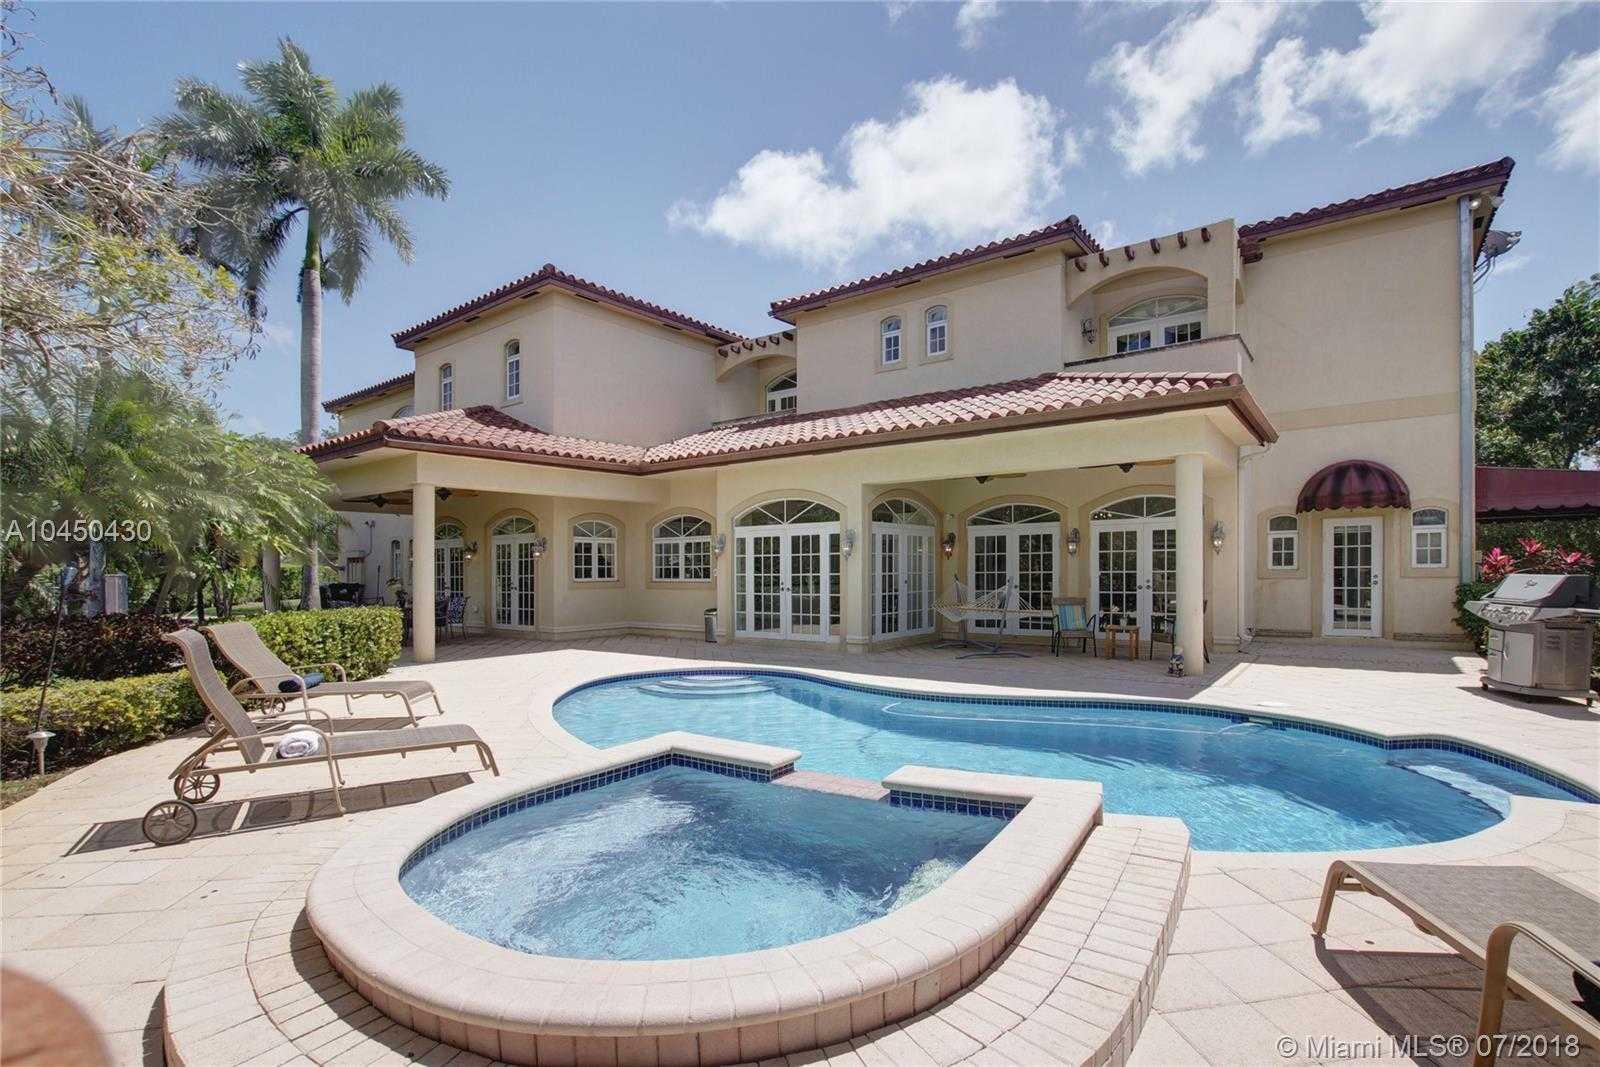 Palmetto Bay Homes for Sale: Miami FL Real Estate on water bay, storage bay, parking bay, car bay, warehouse bay, jungle bay, rock bay, land bay,